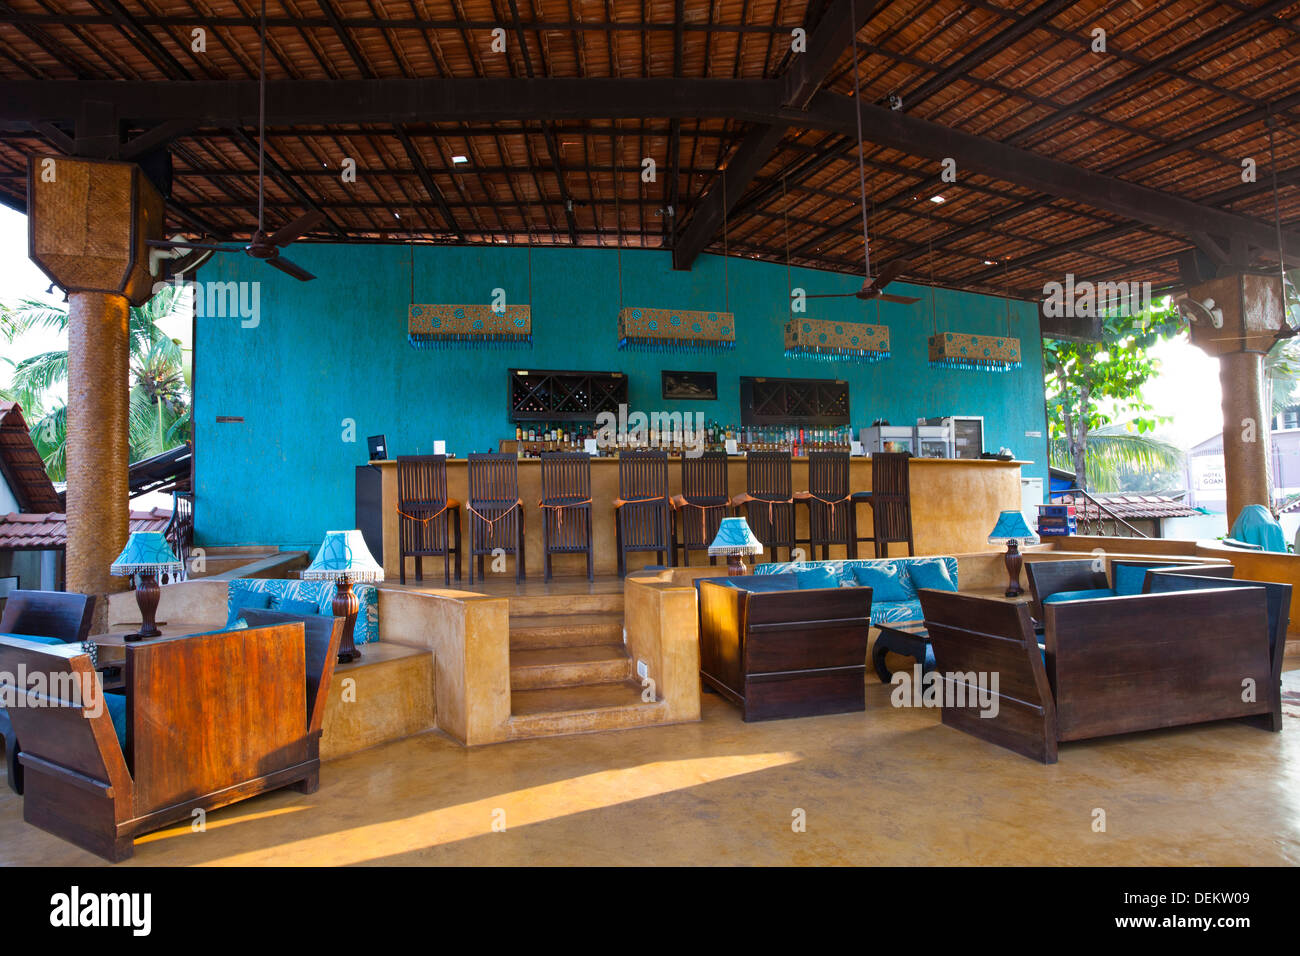 Bar counter at a restaurant, A Reverie, Calangute, North Goa, Goa, India - Stock Image